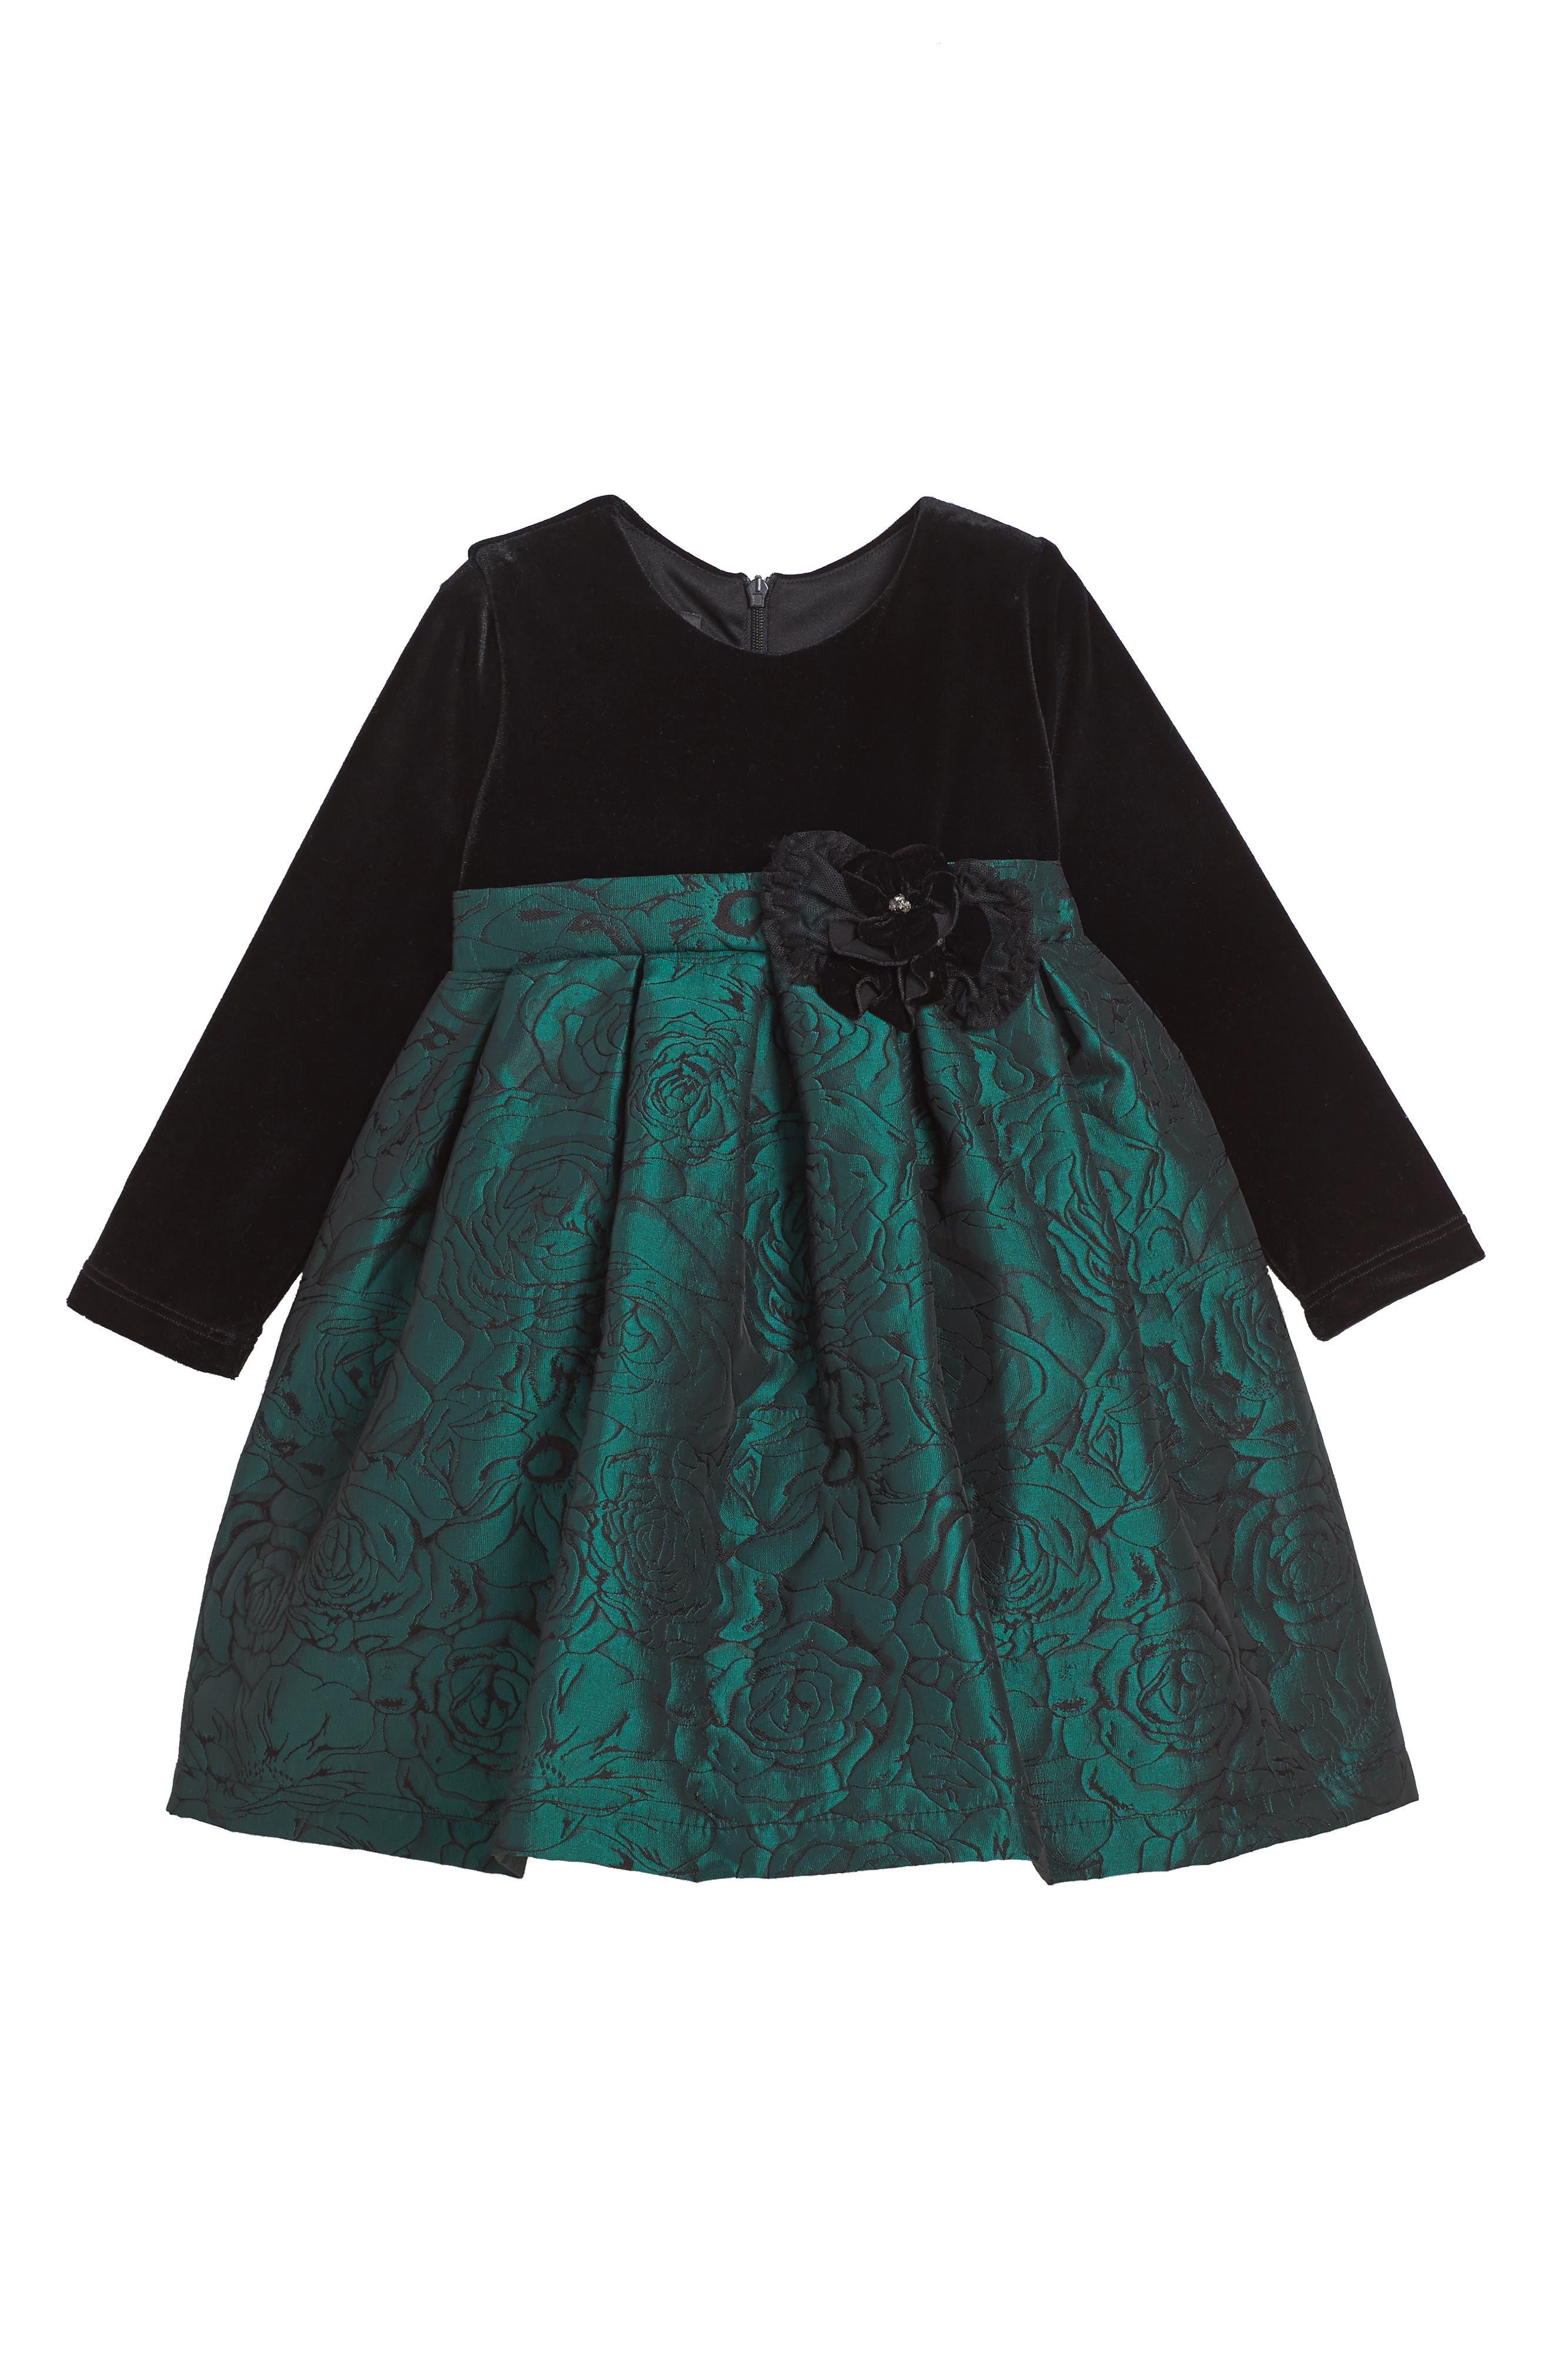 Mistletoe Dress,                         Main,                         color, Green